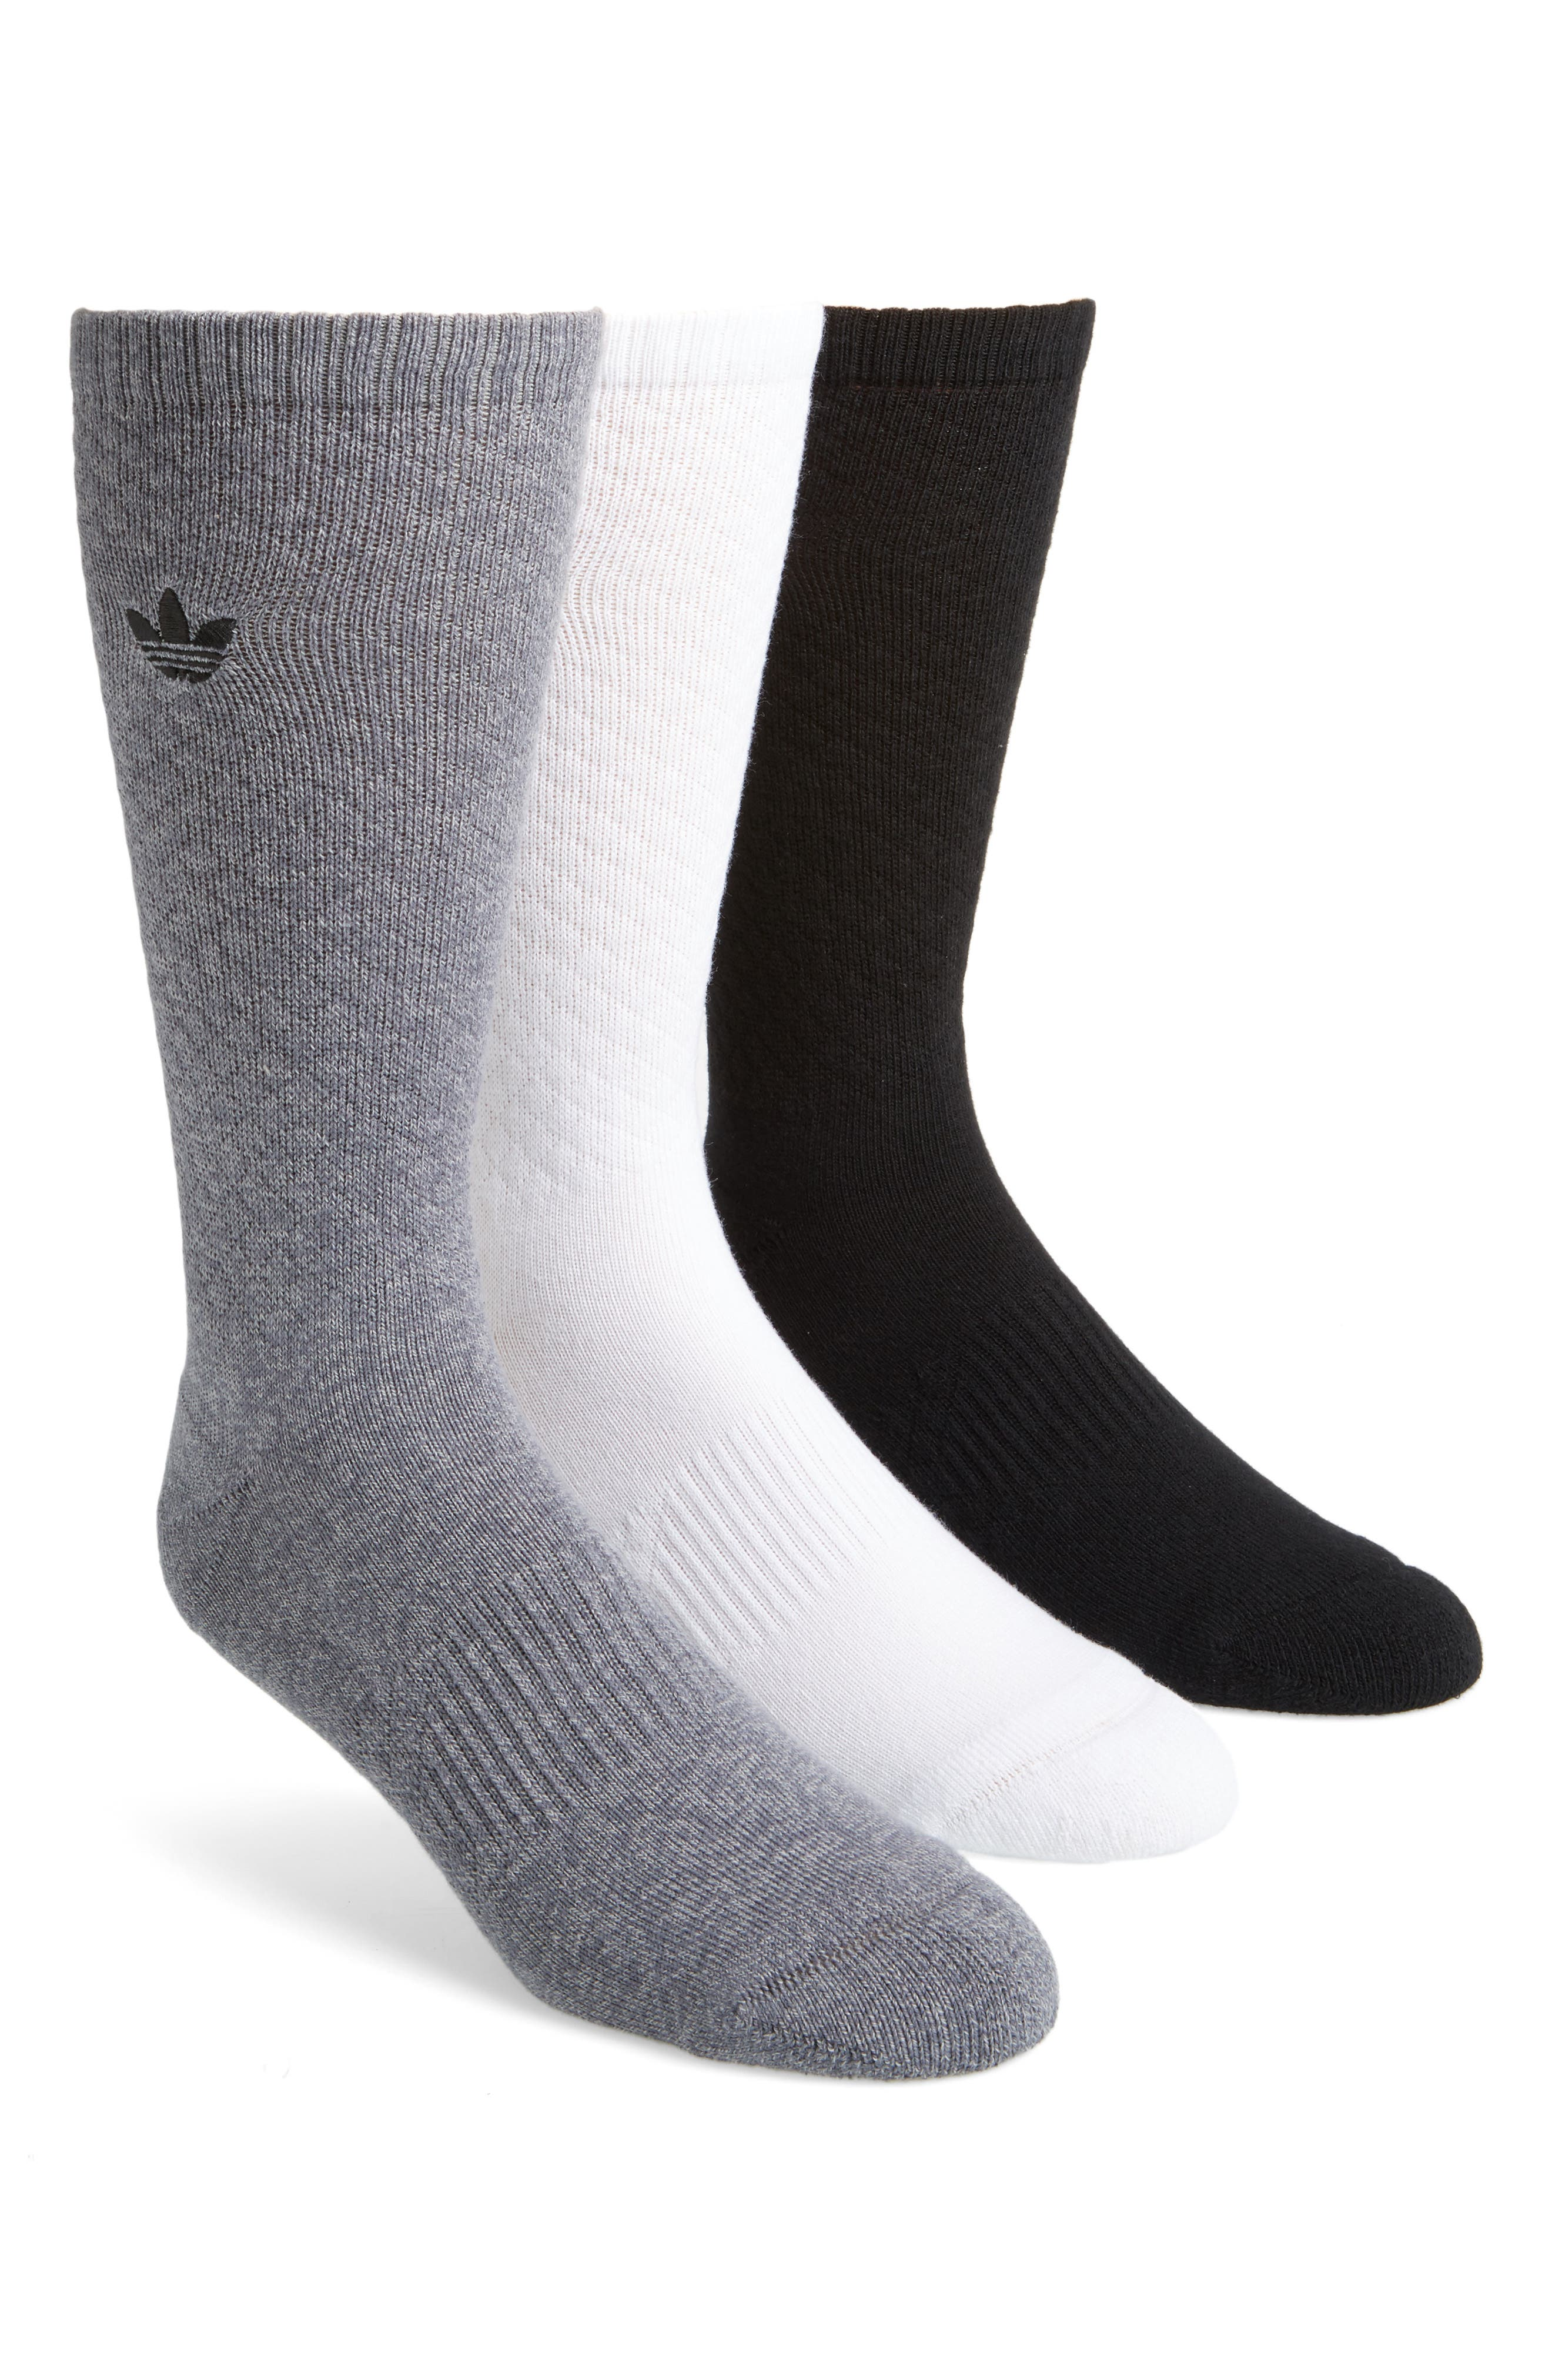 Main Image - adidas Originals 3-Pack Quilted Socks